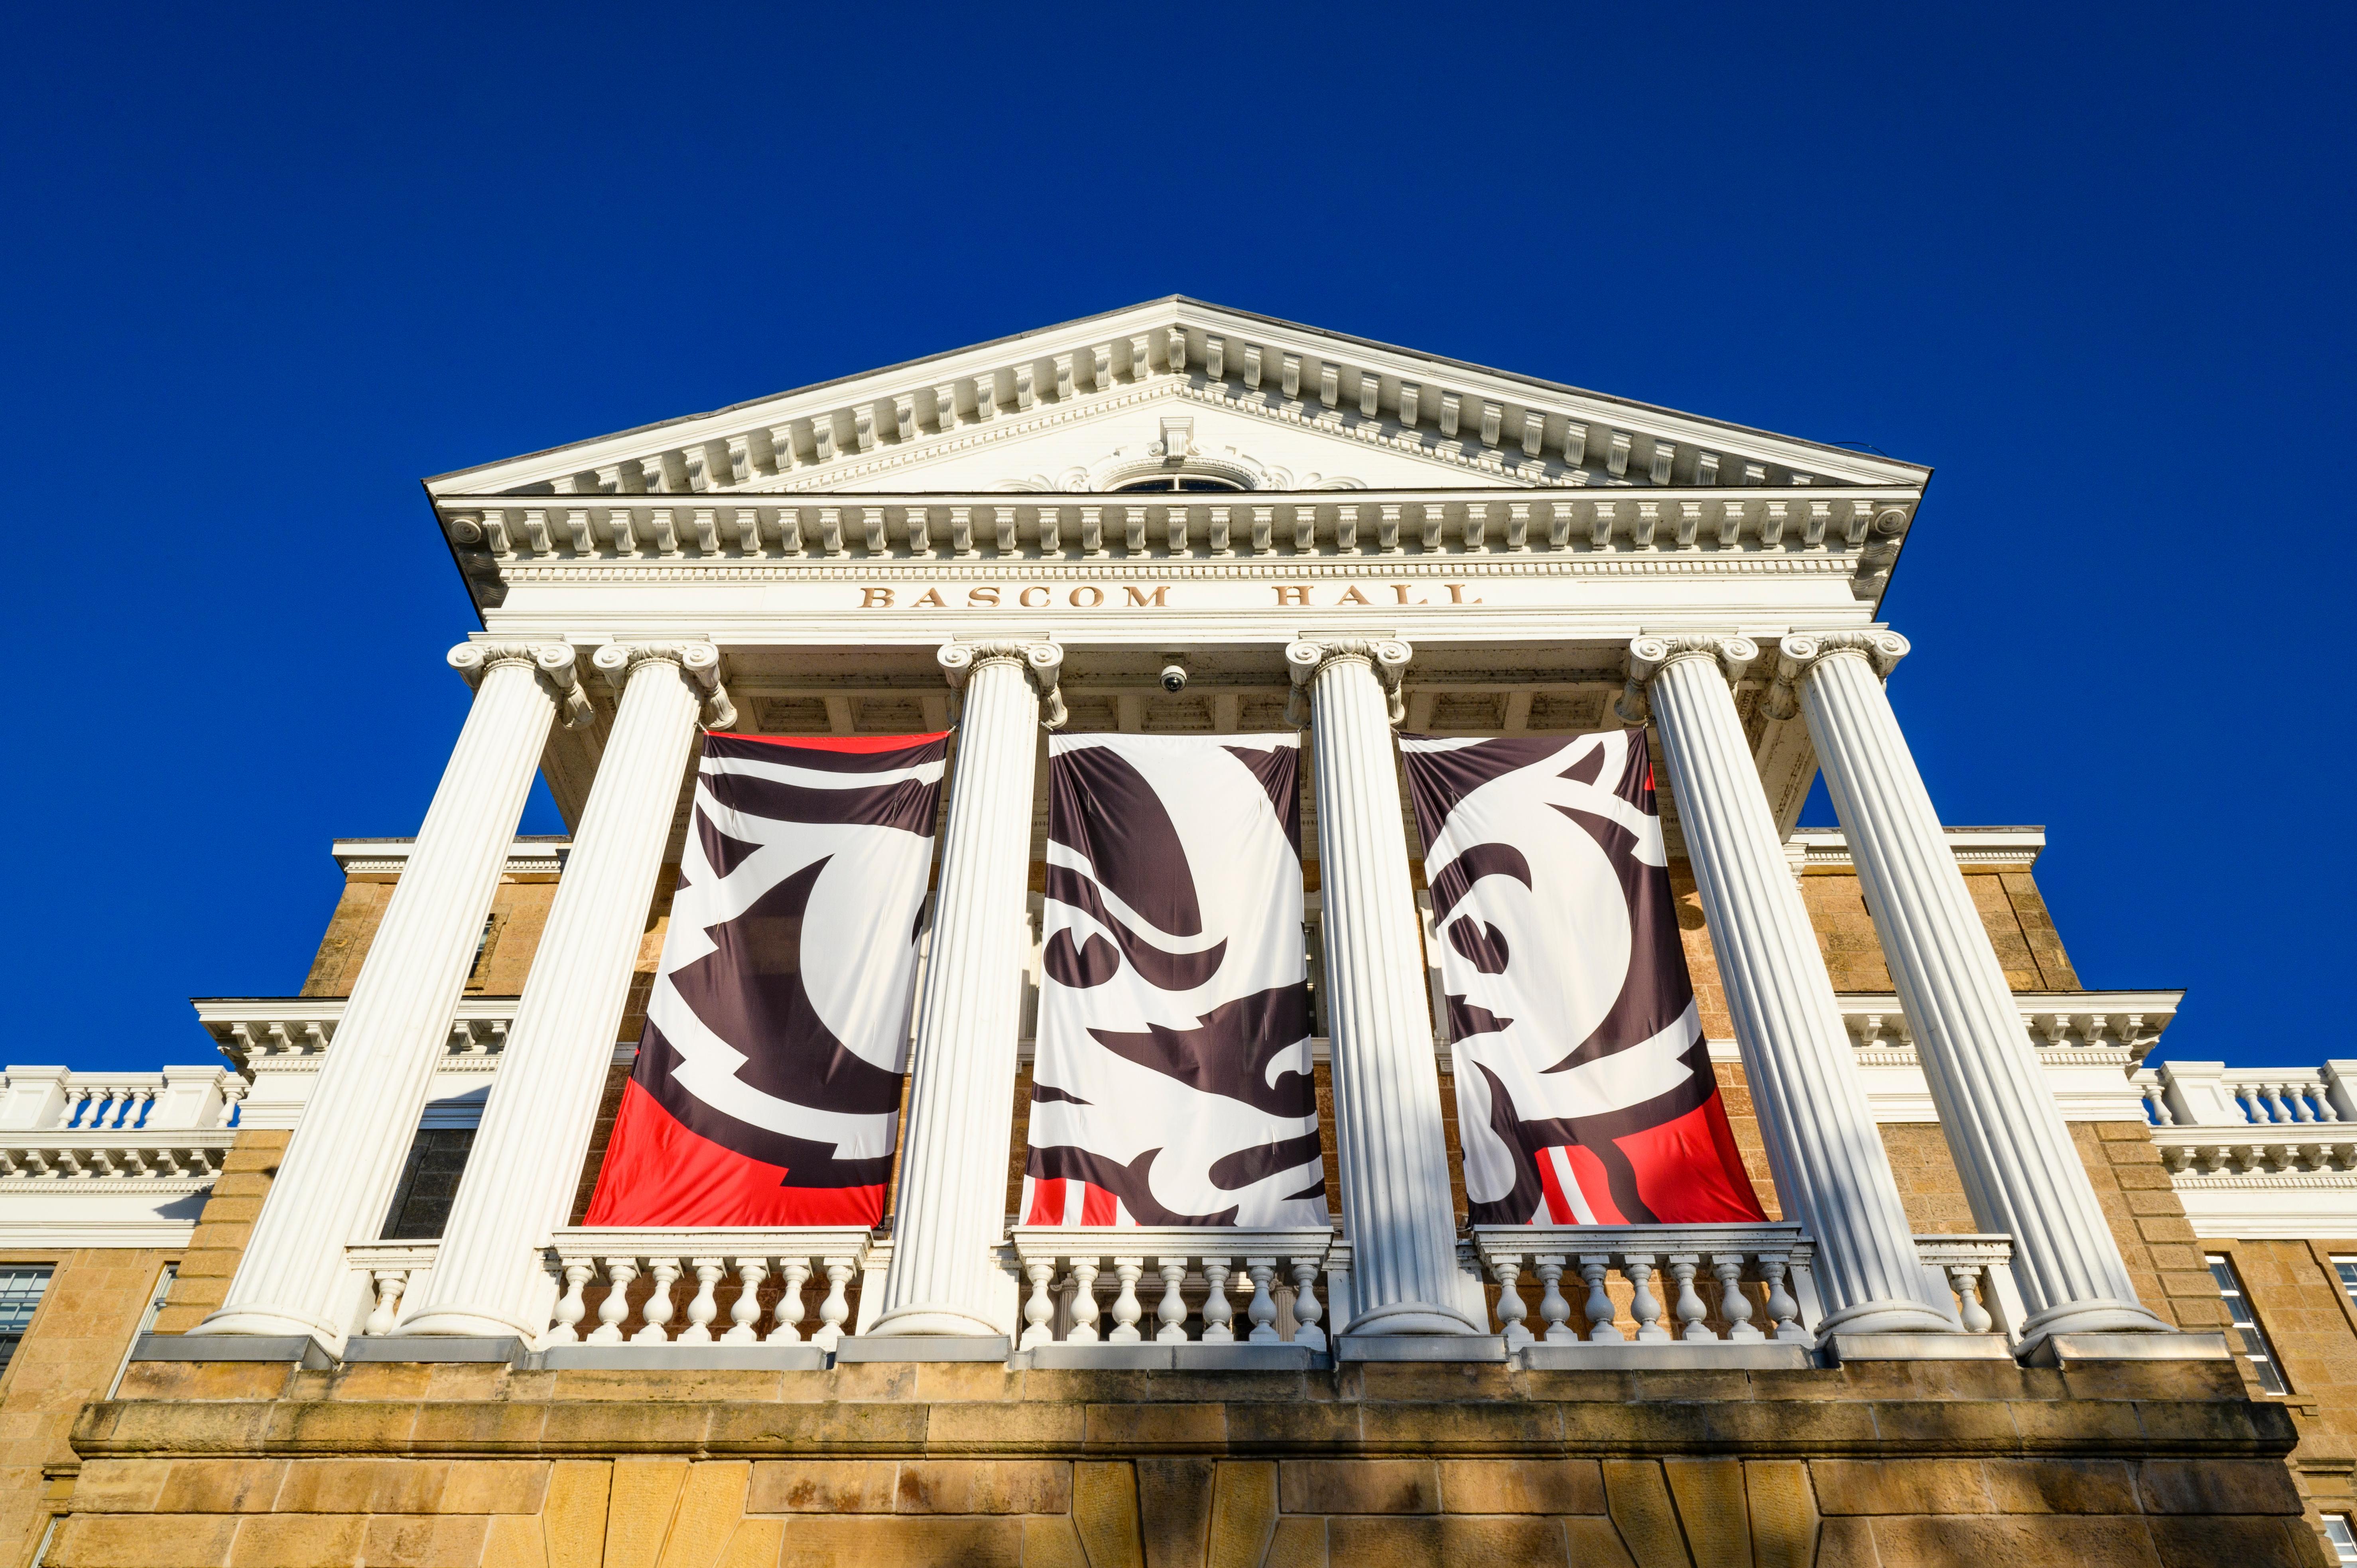 Bascom Hall with Bucky banner